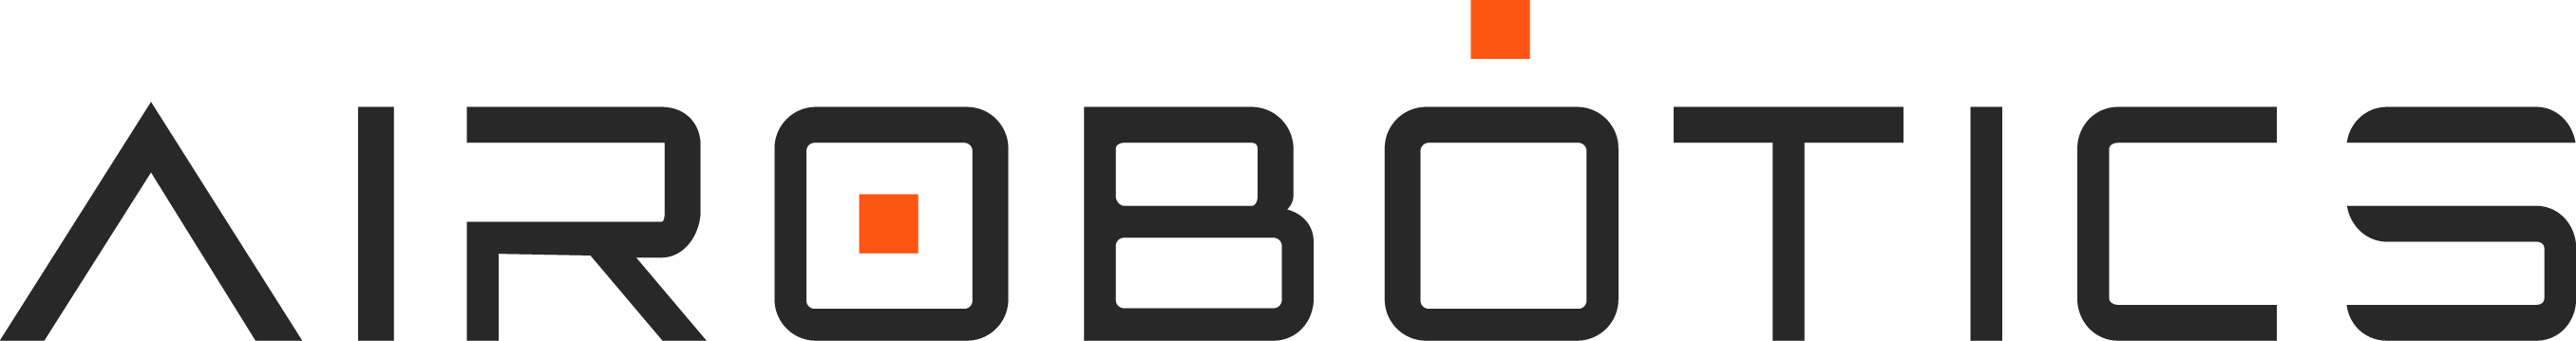 Airobotics company logo